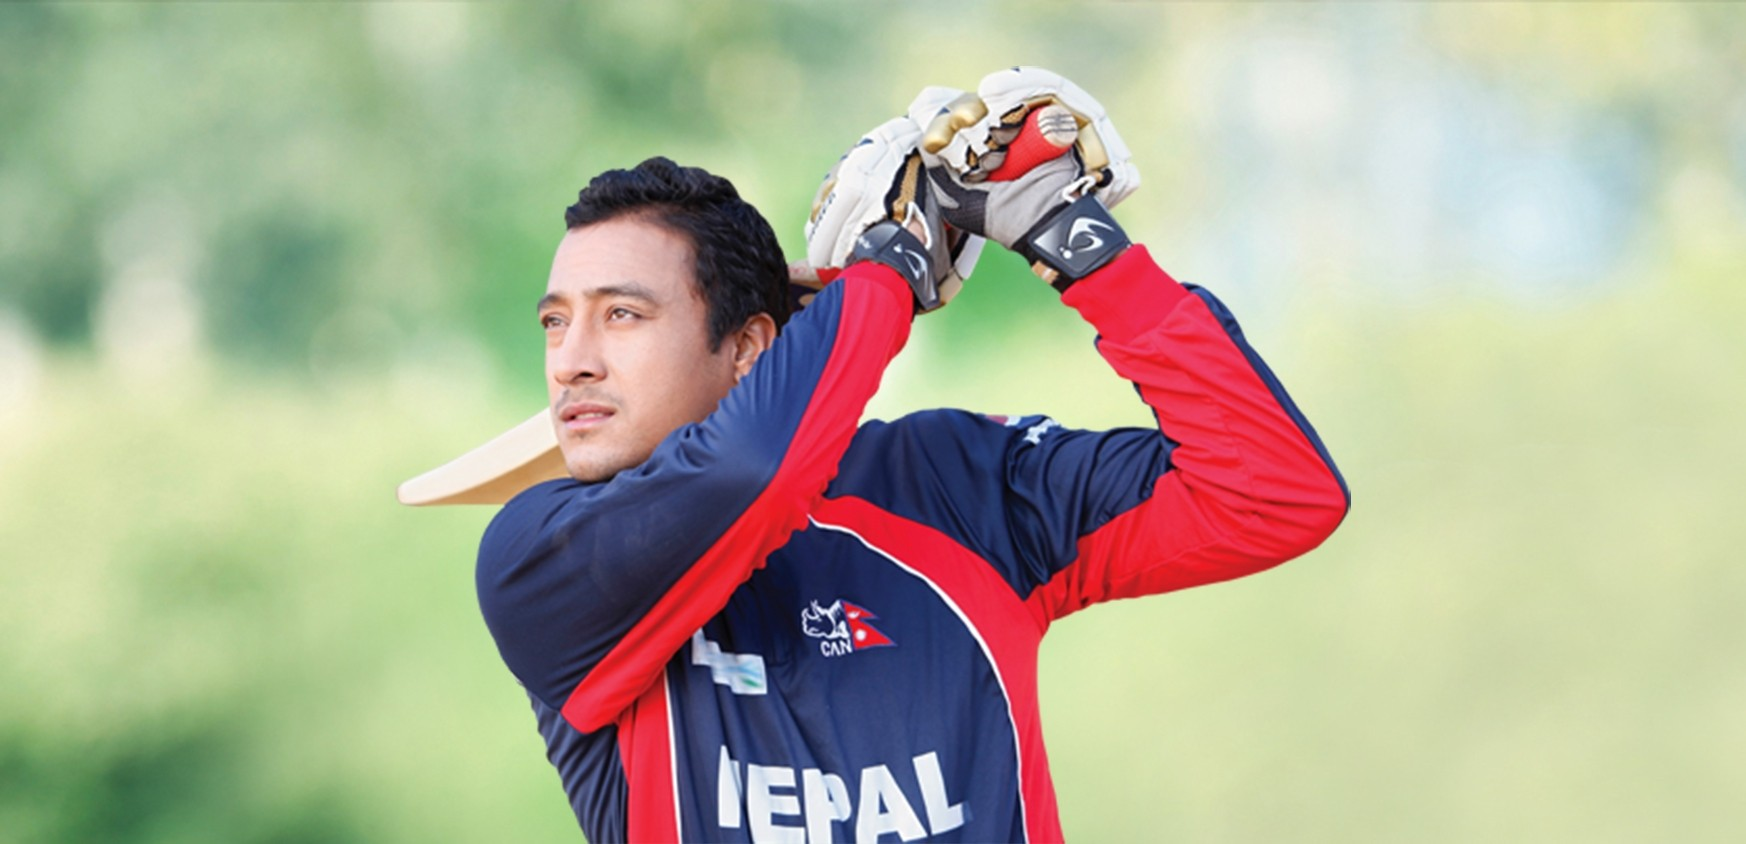 नेपाली क्रिकेटका पूर्वकप्तान पारस खड्काले सन्यास लिने घोषणा